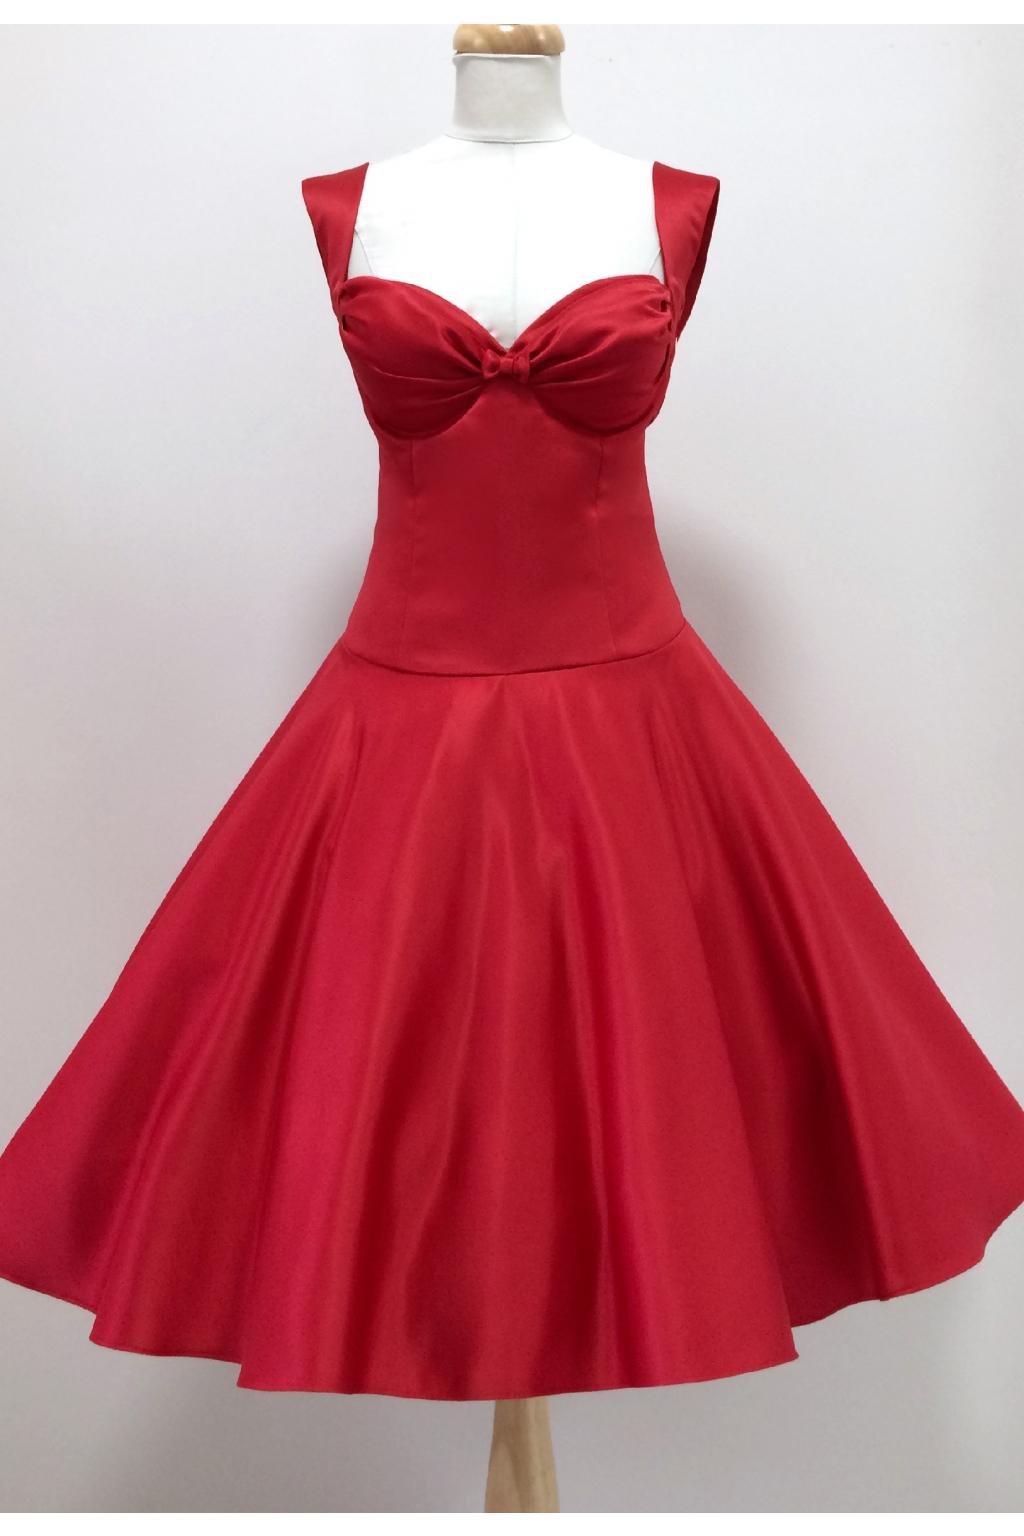 Červené krátké plesové šaty Louisa